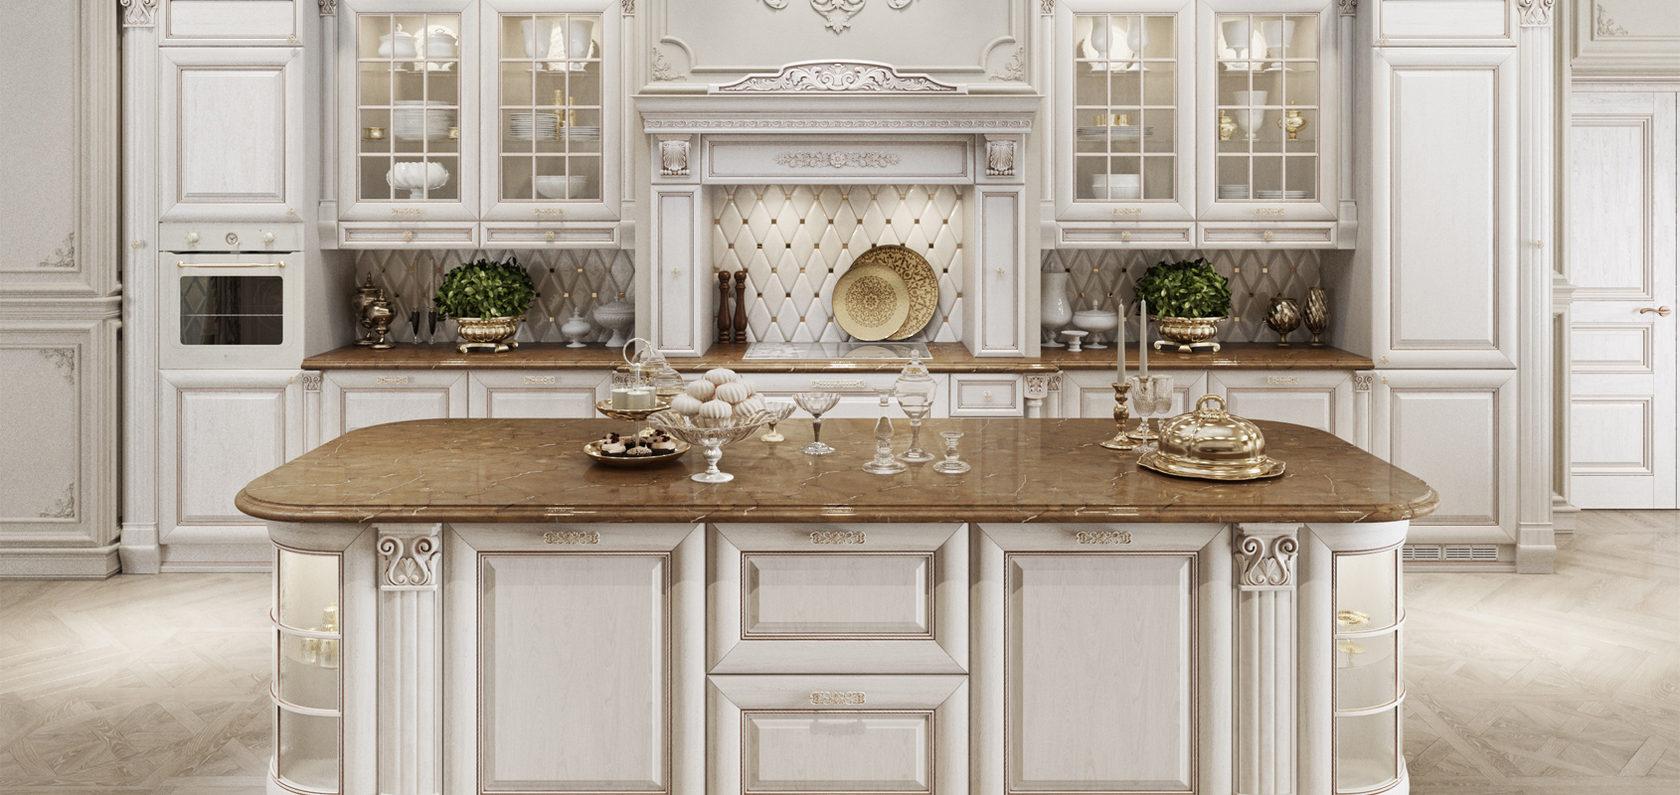 кухни с витринами в классическом стиле фото вами